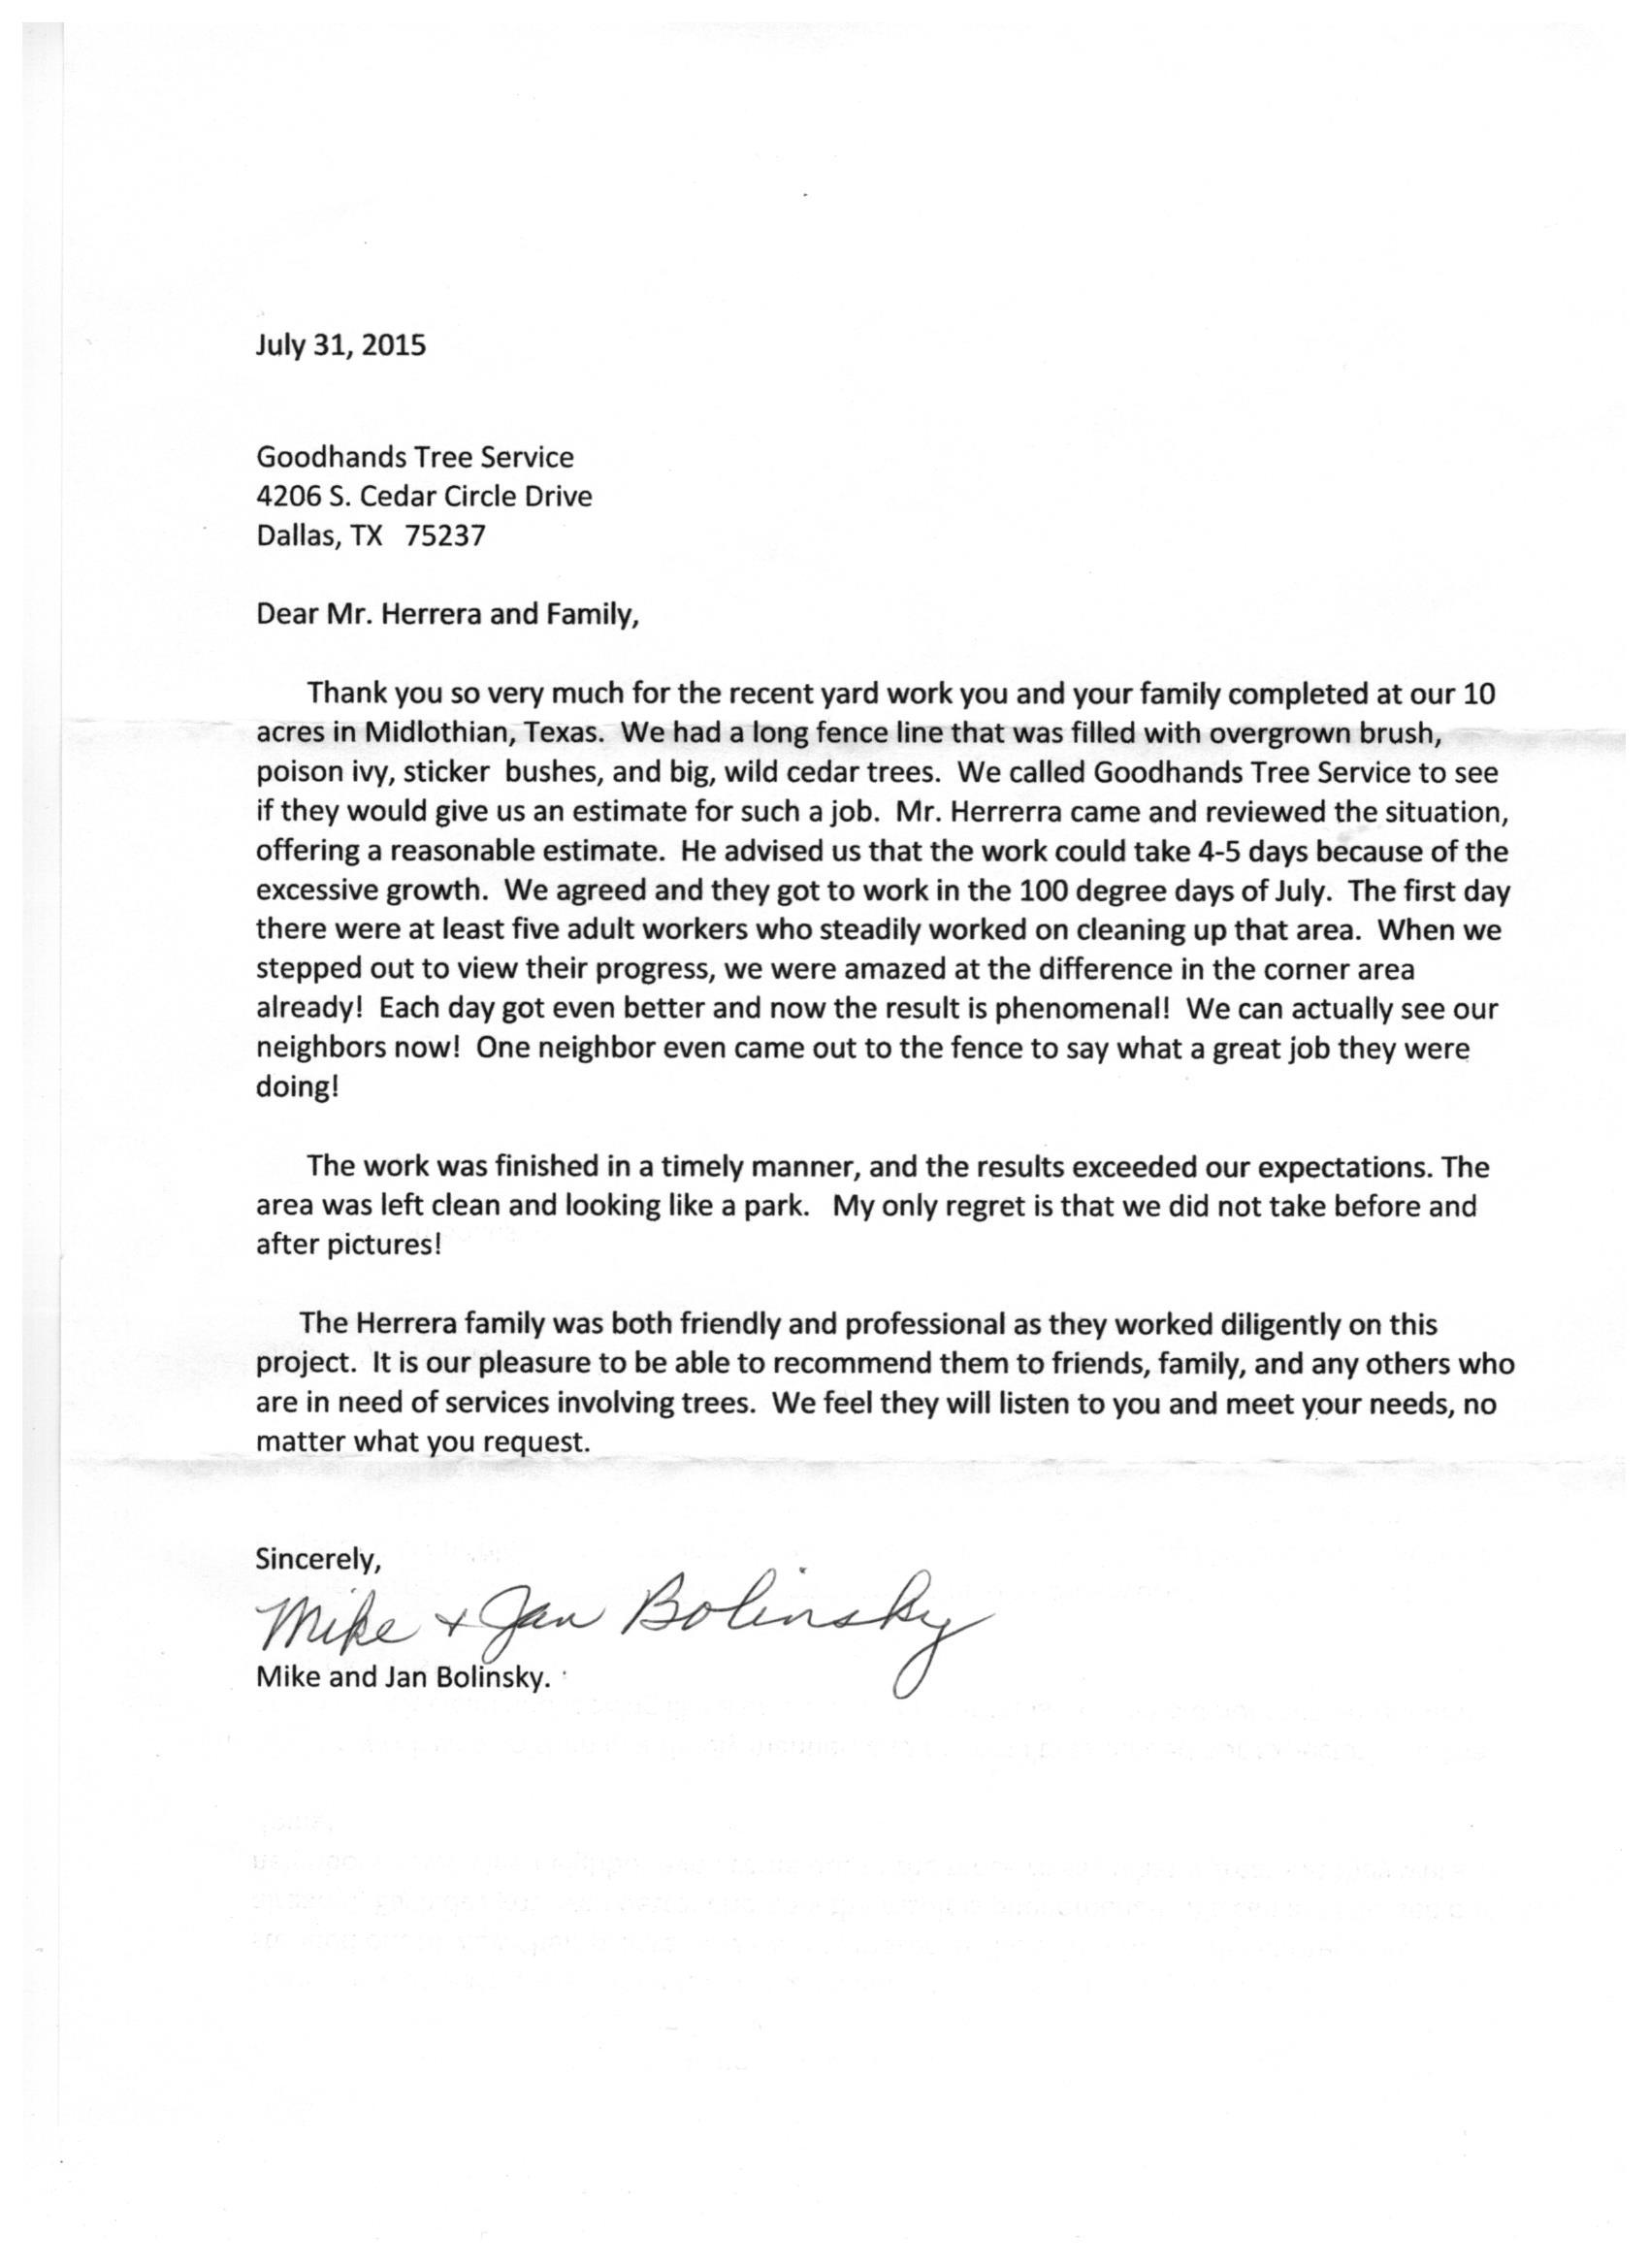 jan bolinsky letter recomandation.jpg